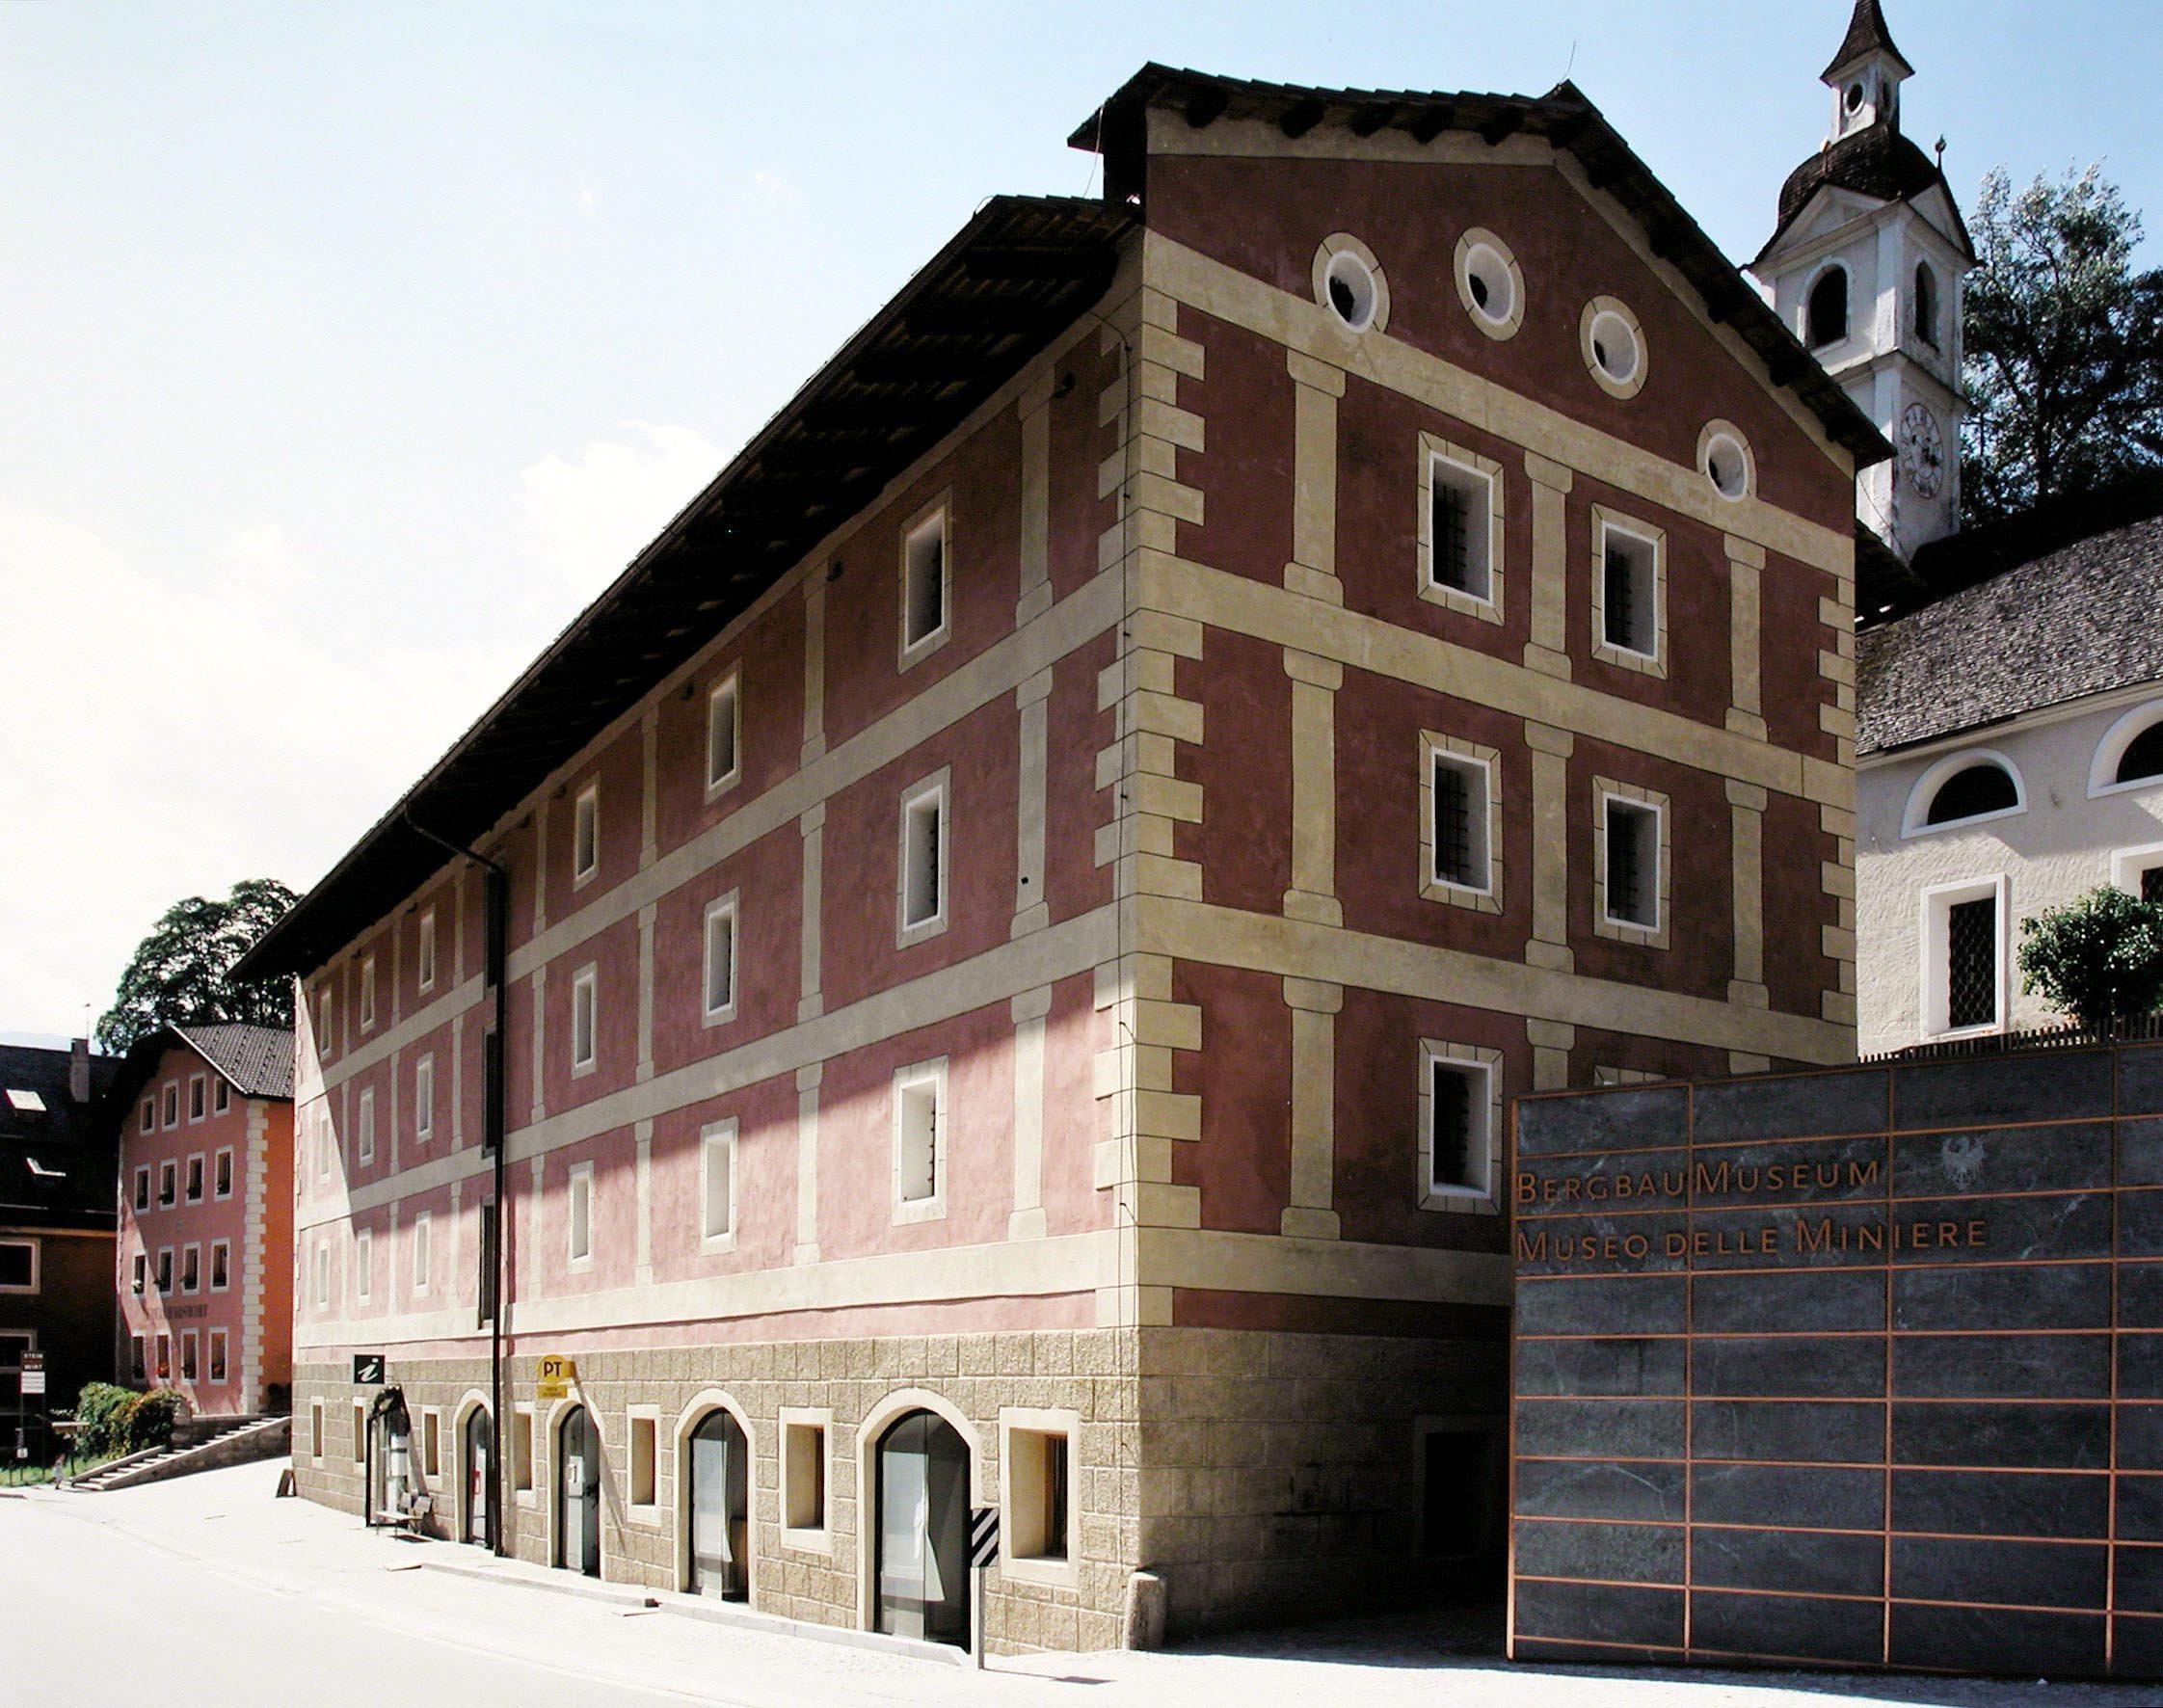 Museo delle miniere Granaio Cadipietra